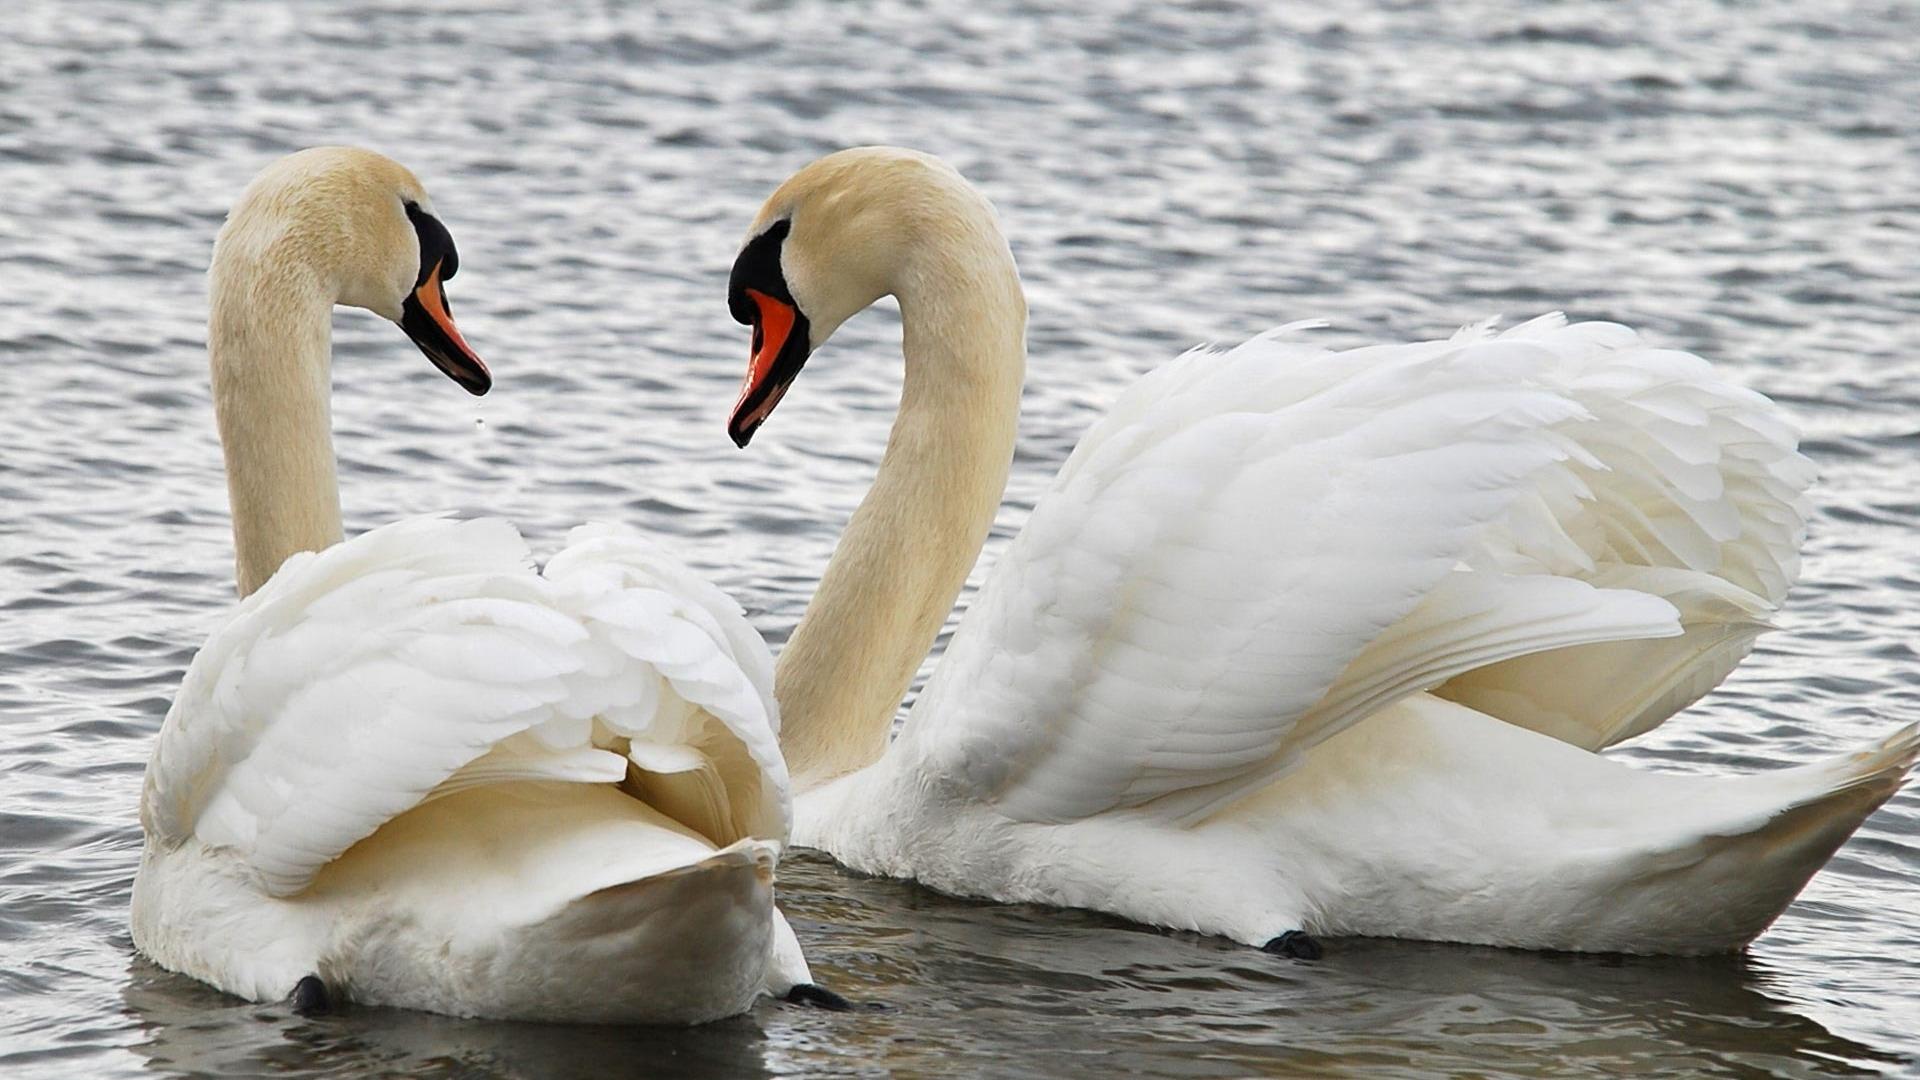 Swans wallpaper 262 1920x1080